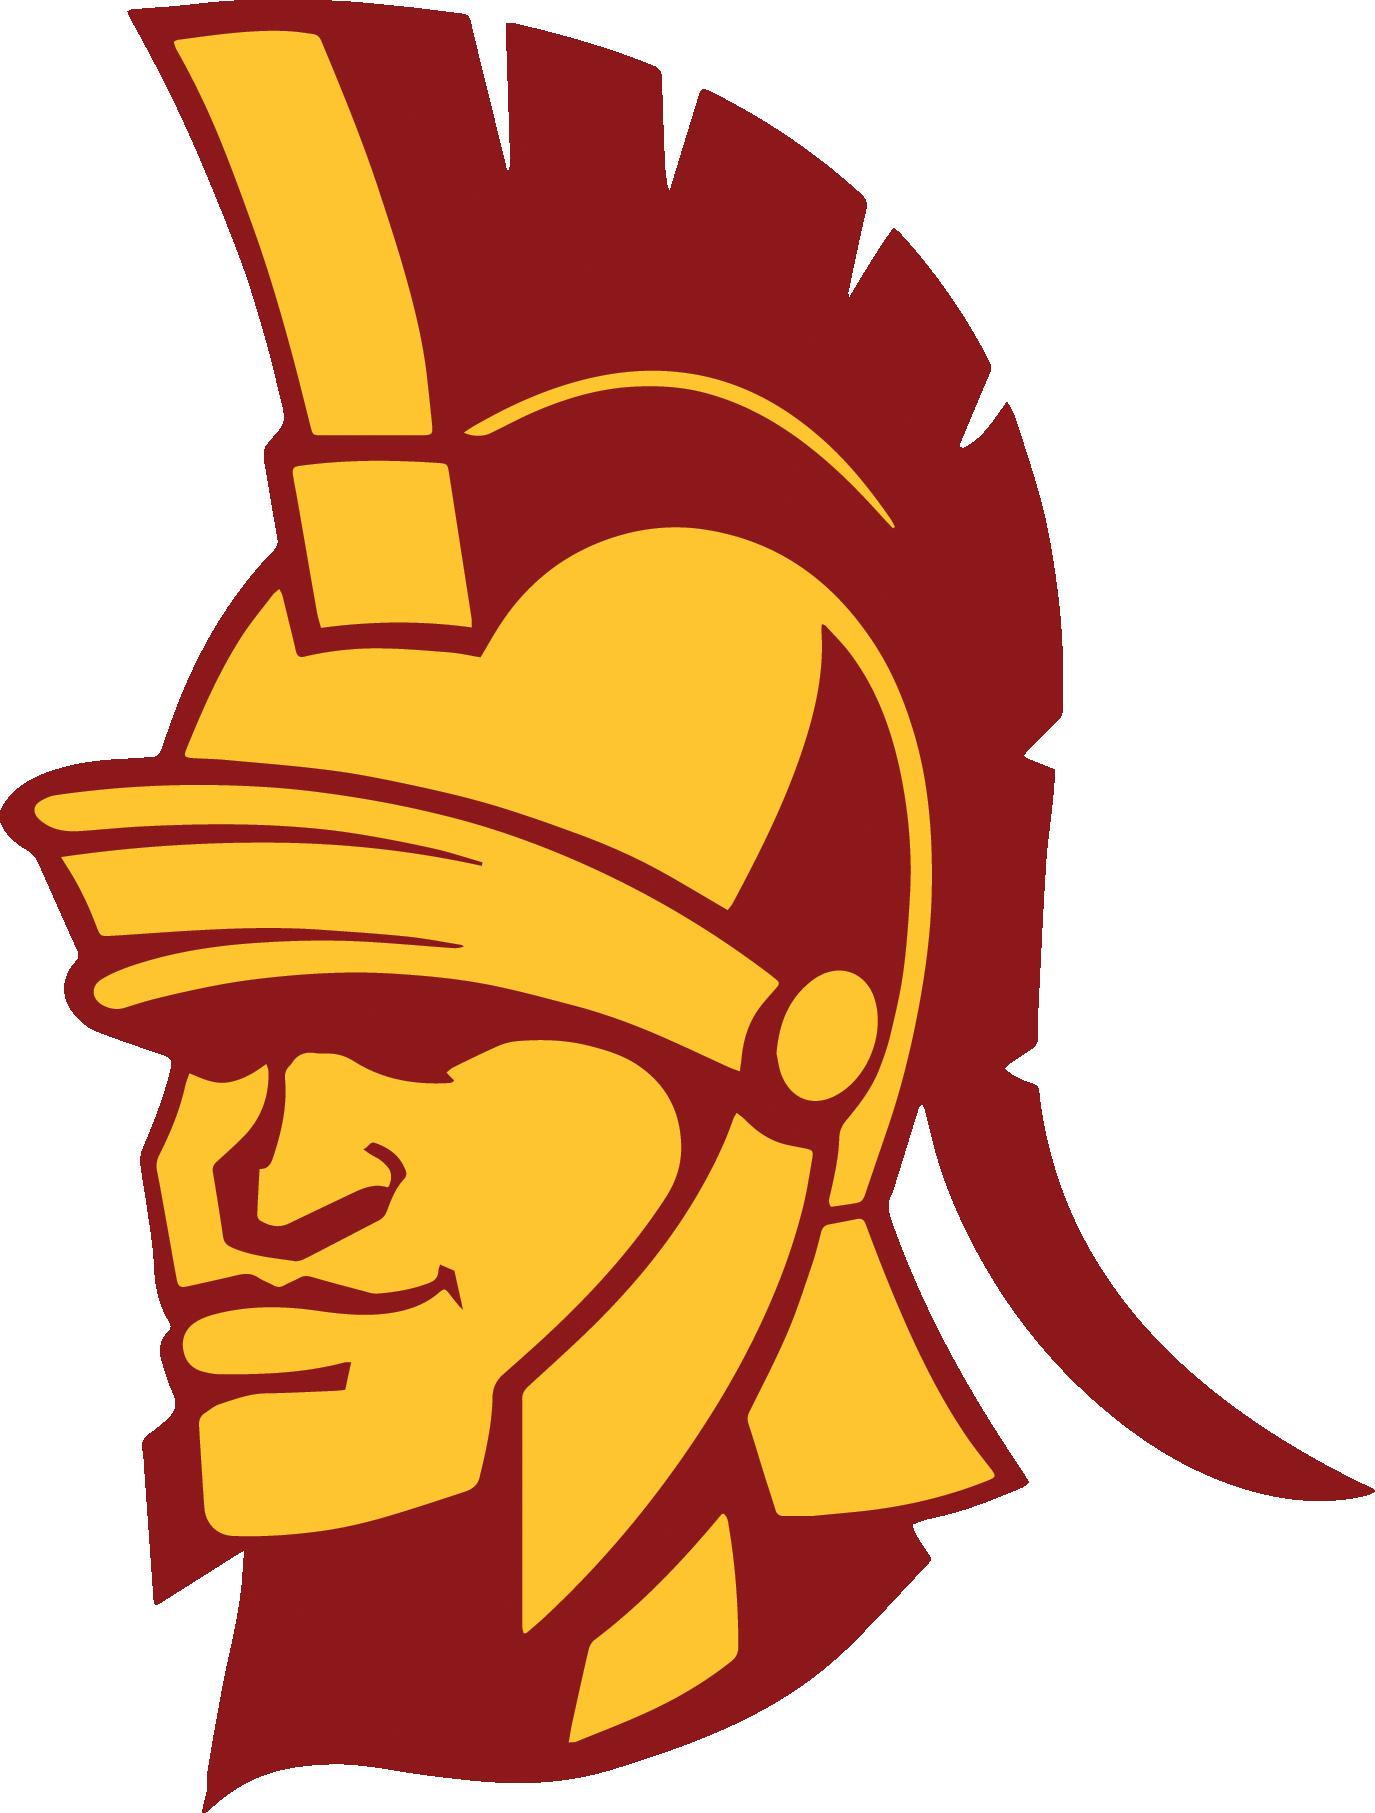 USC Hybrid Trojans